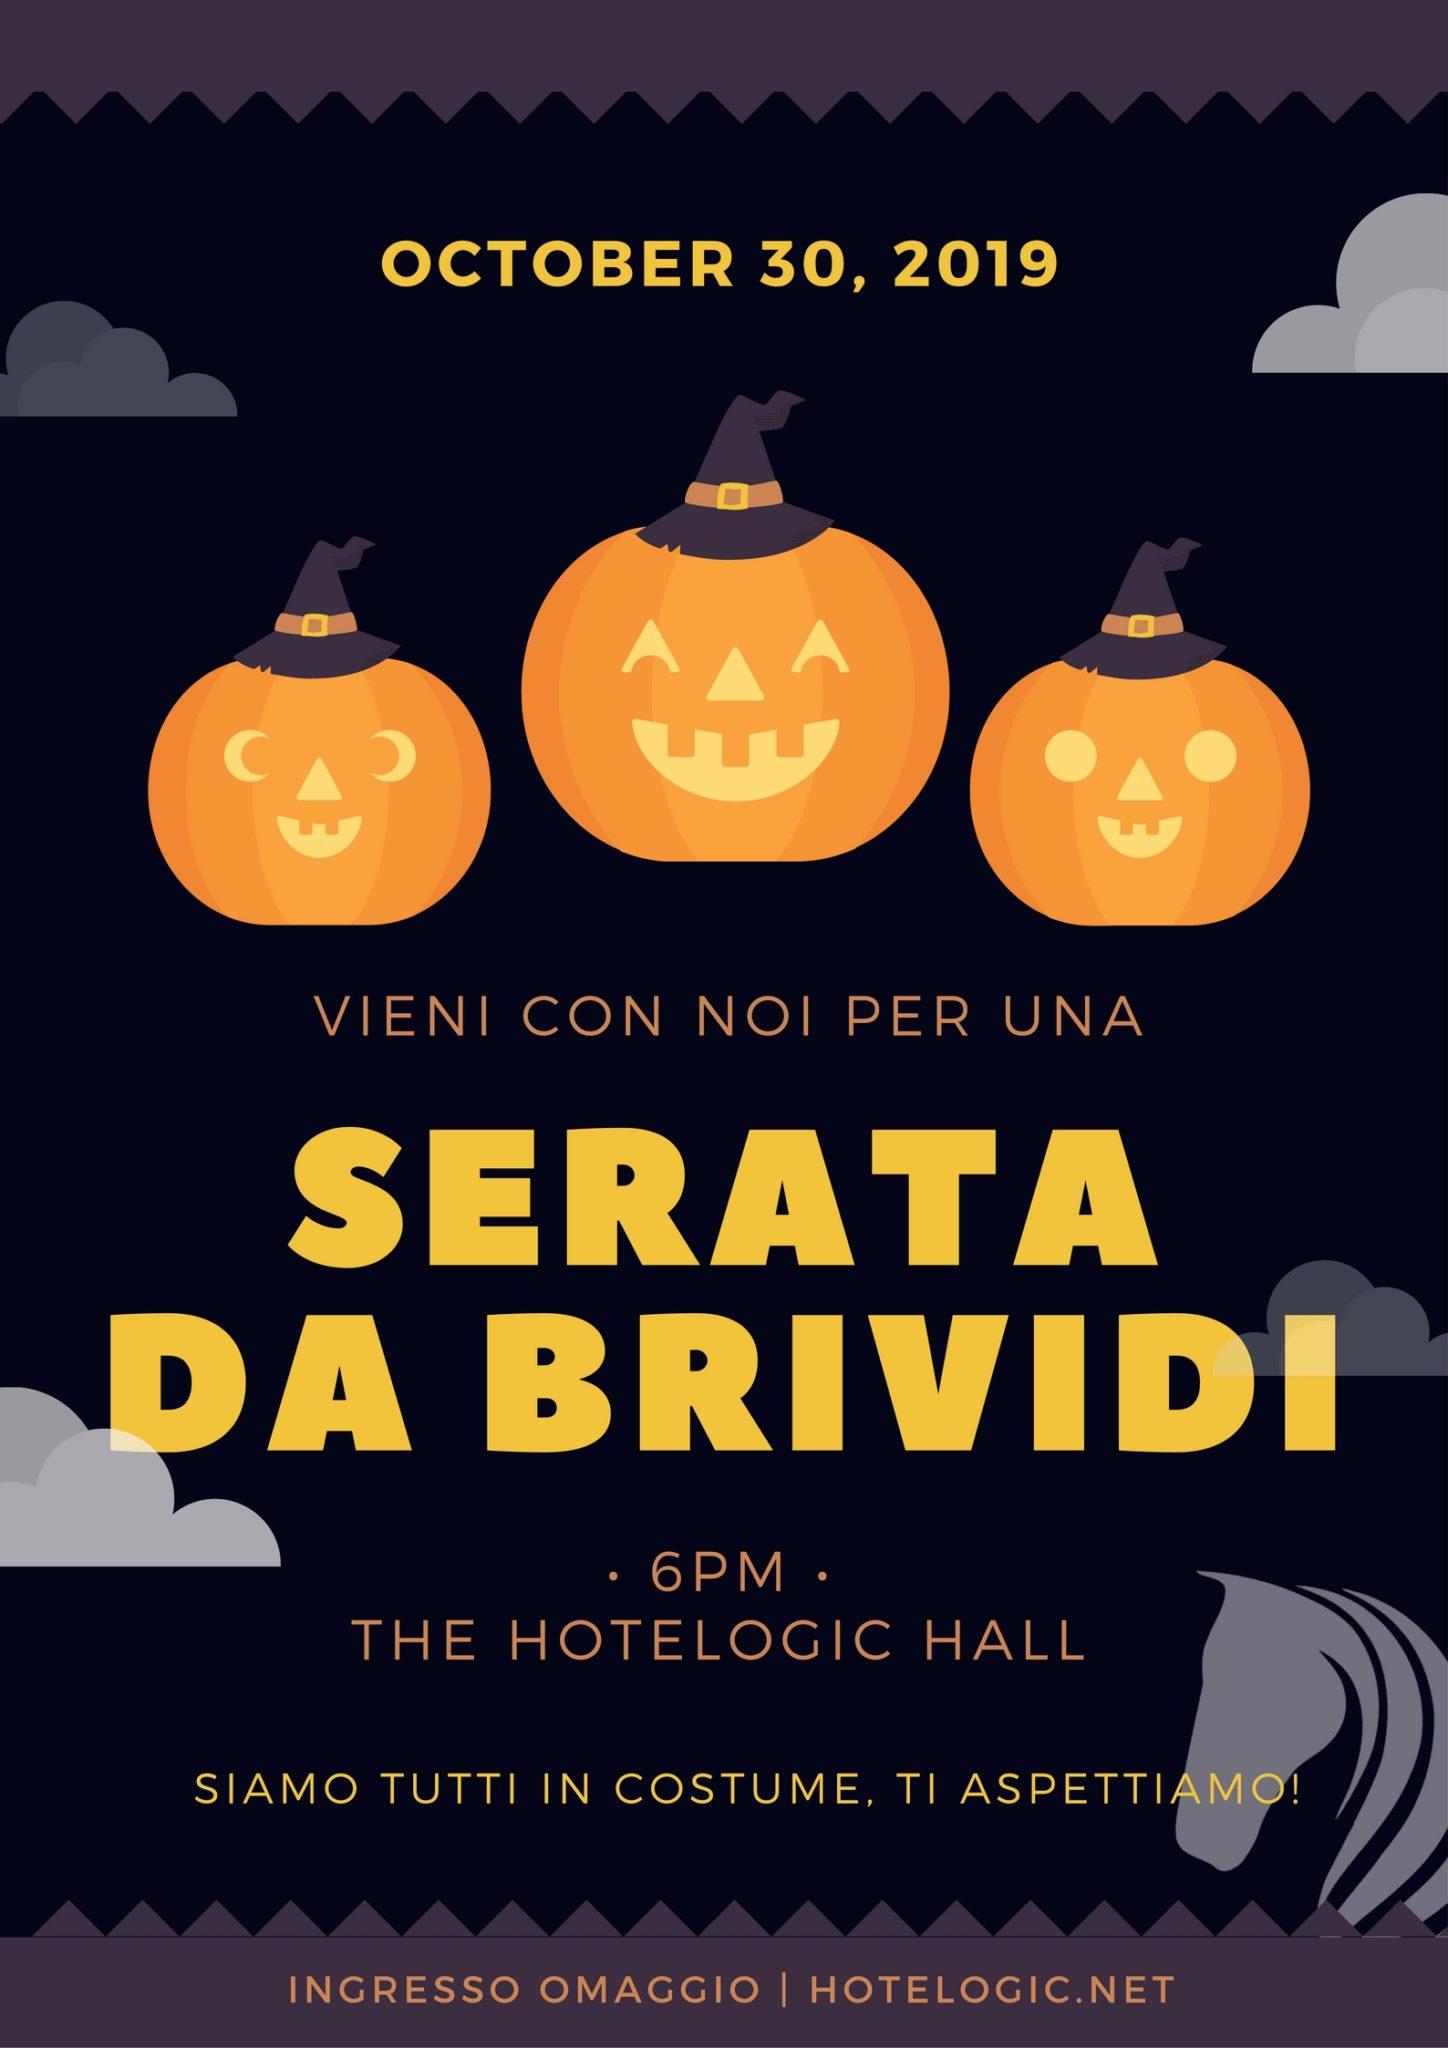 Hotelogic - Poster di esempio per Halloween